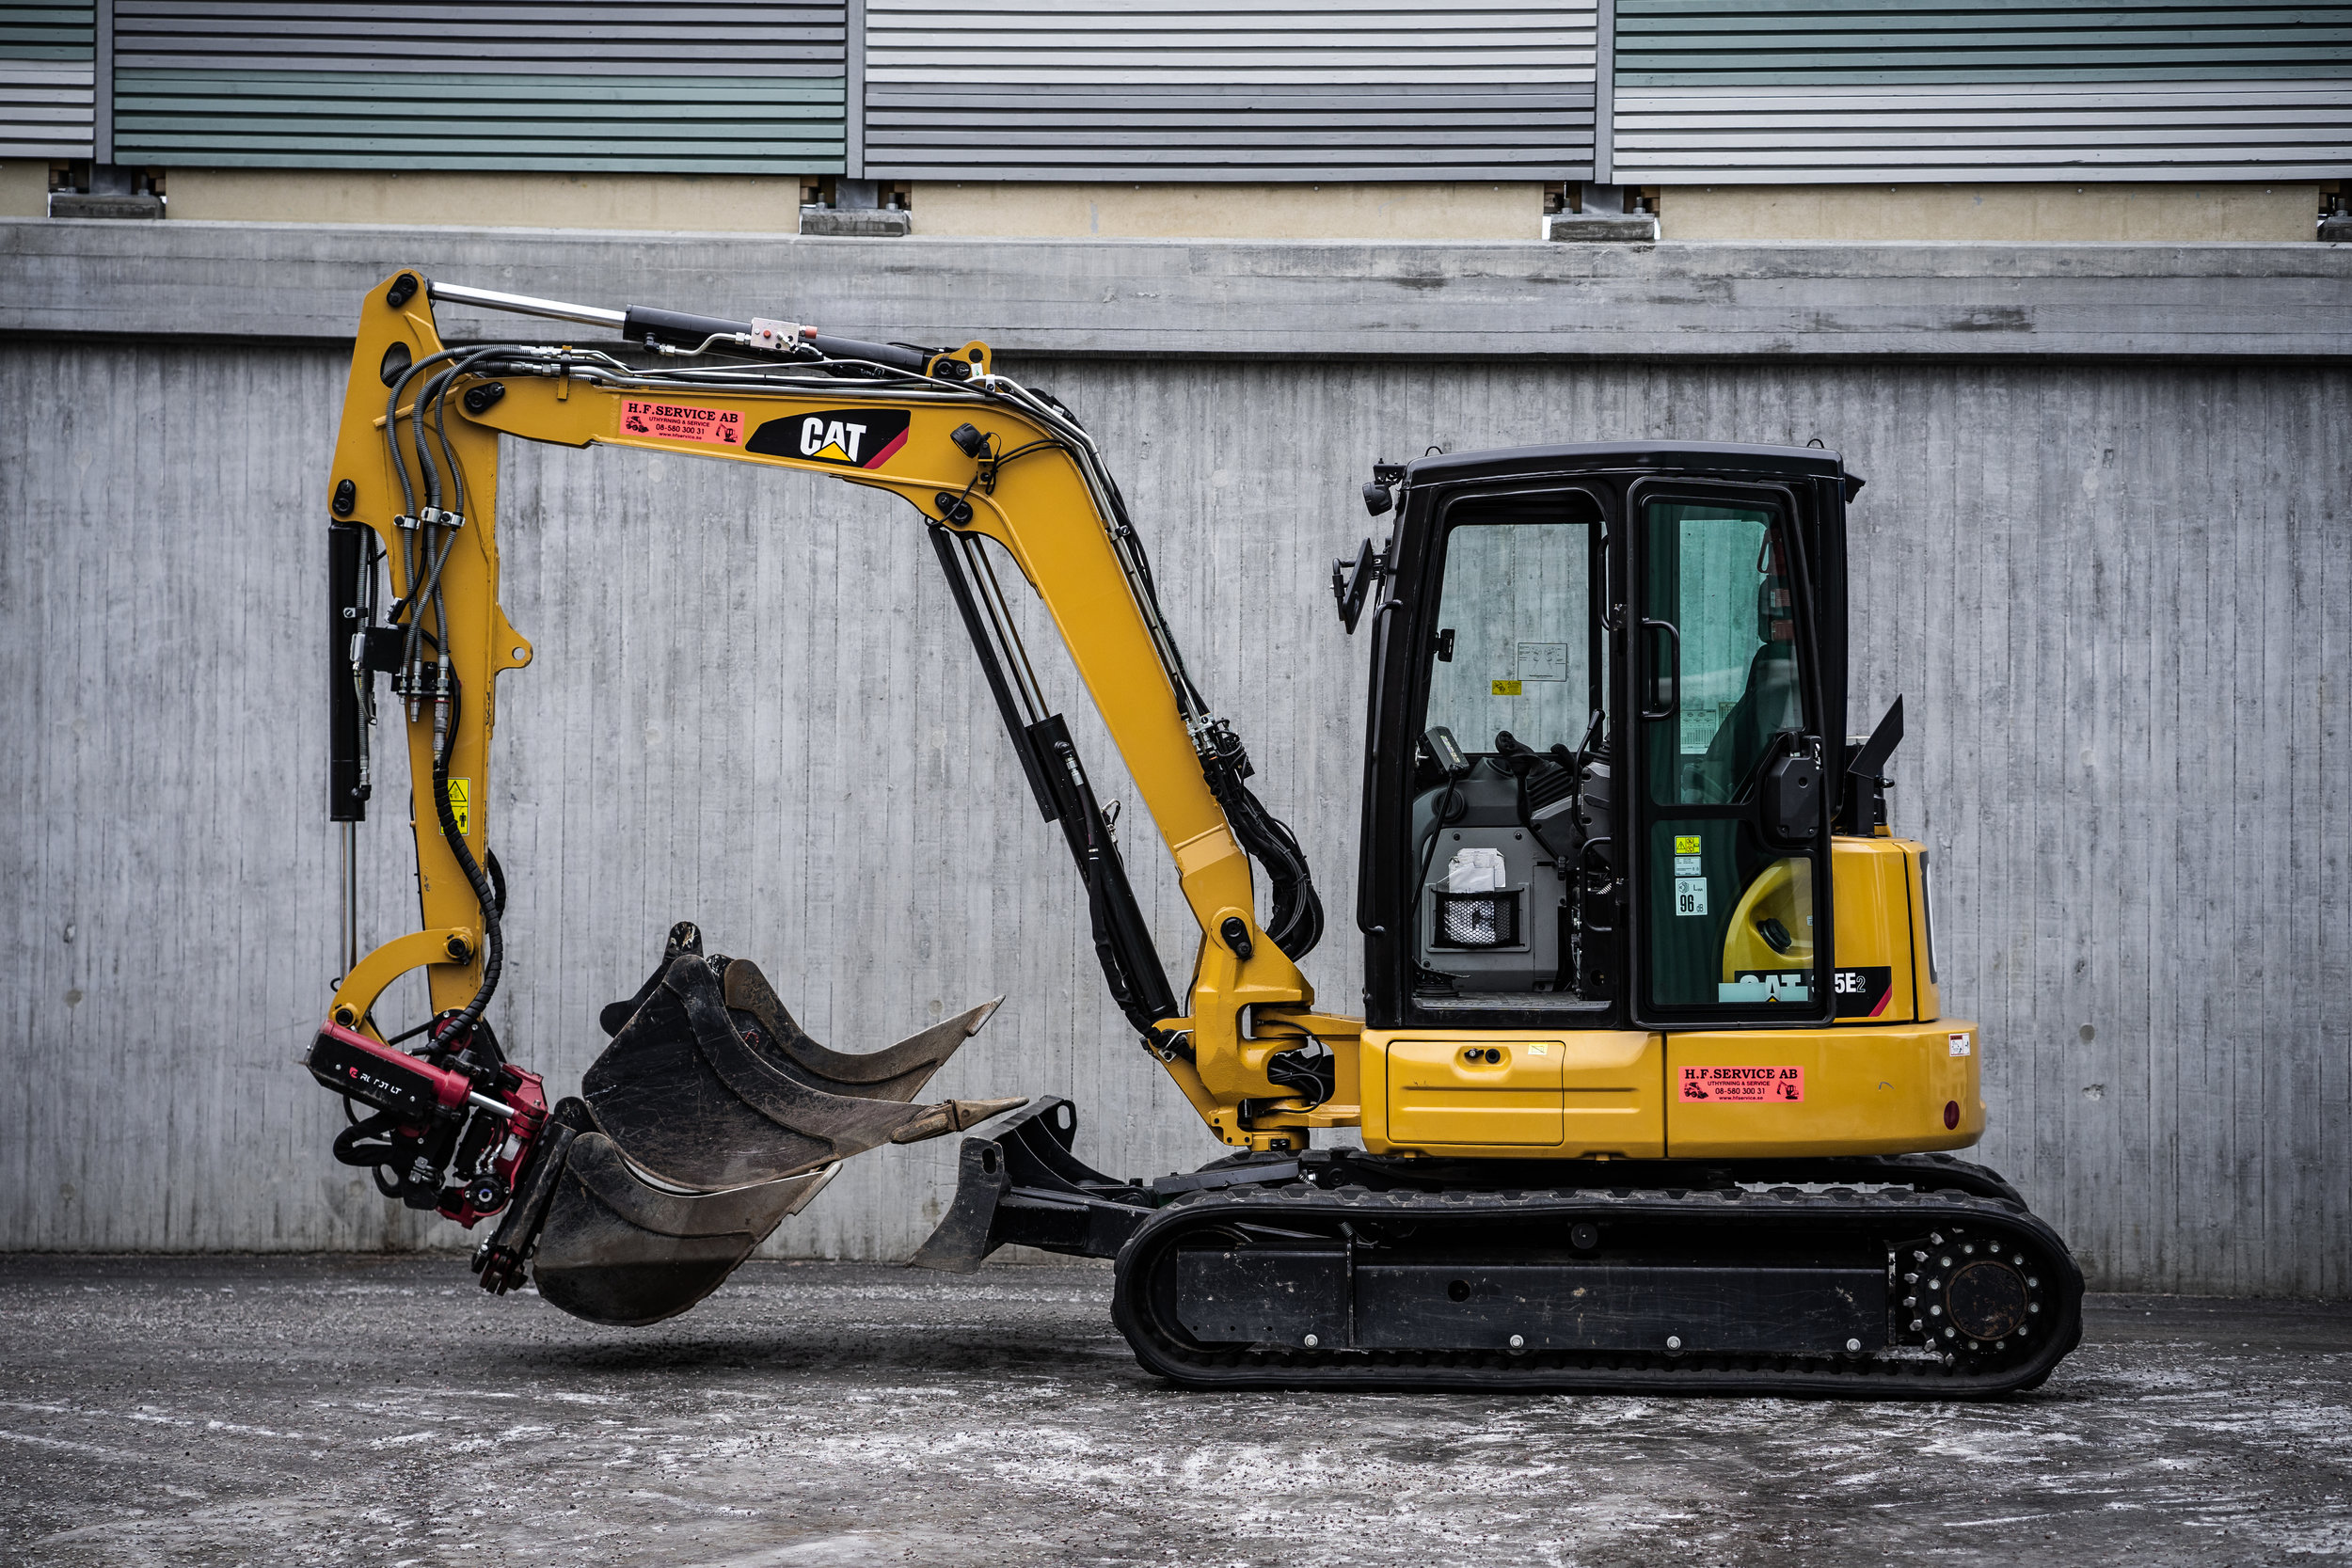 Maskindata Cat 305 E2 - Vikt: 5423 kgBredd: 198 cmMaximalt grävdjup: 387 cm